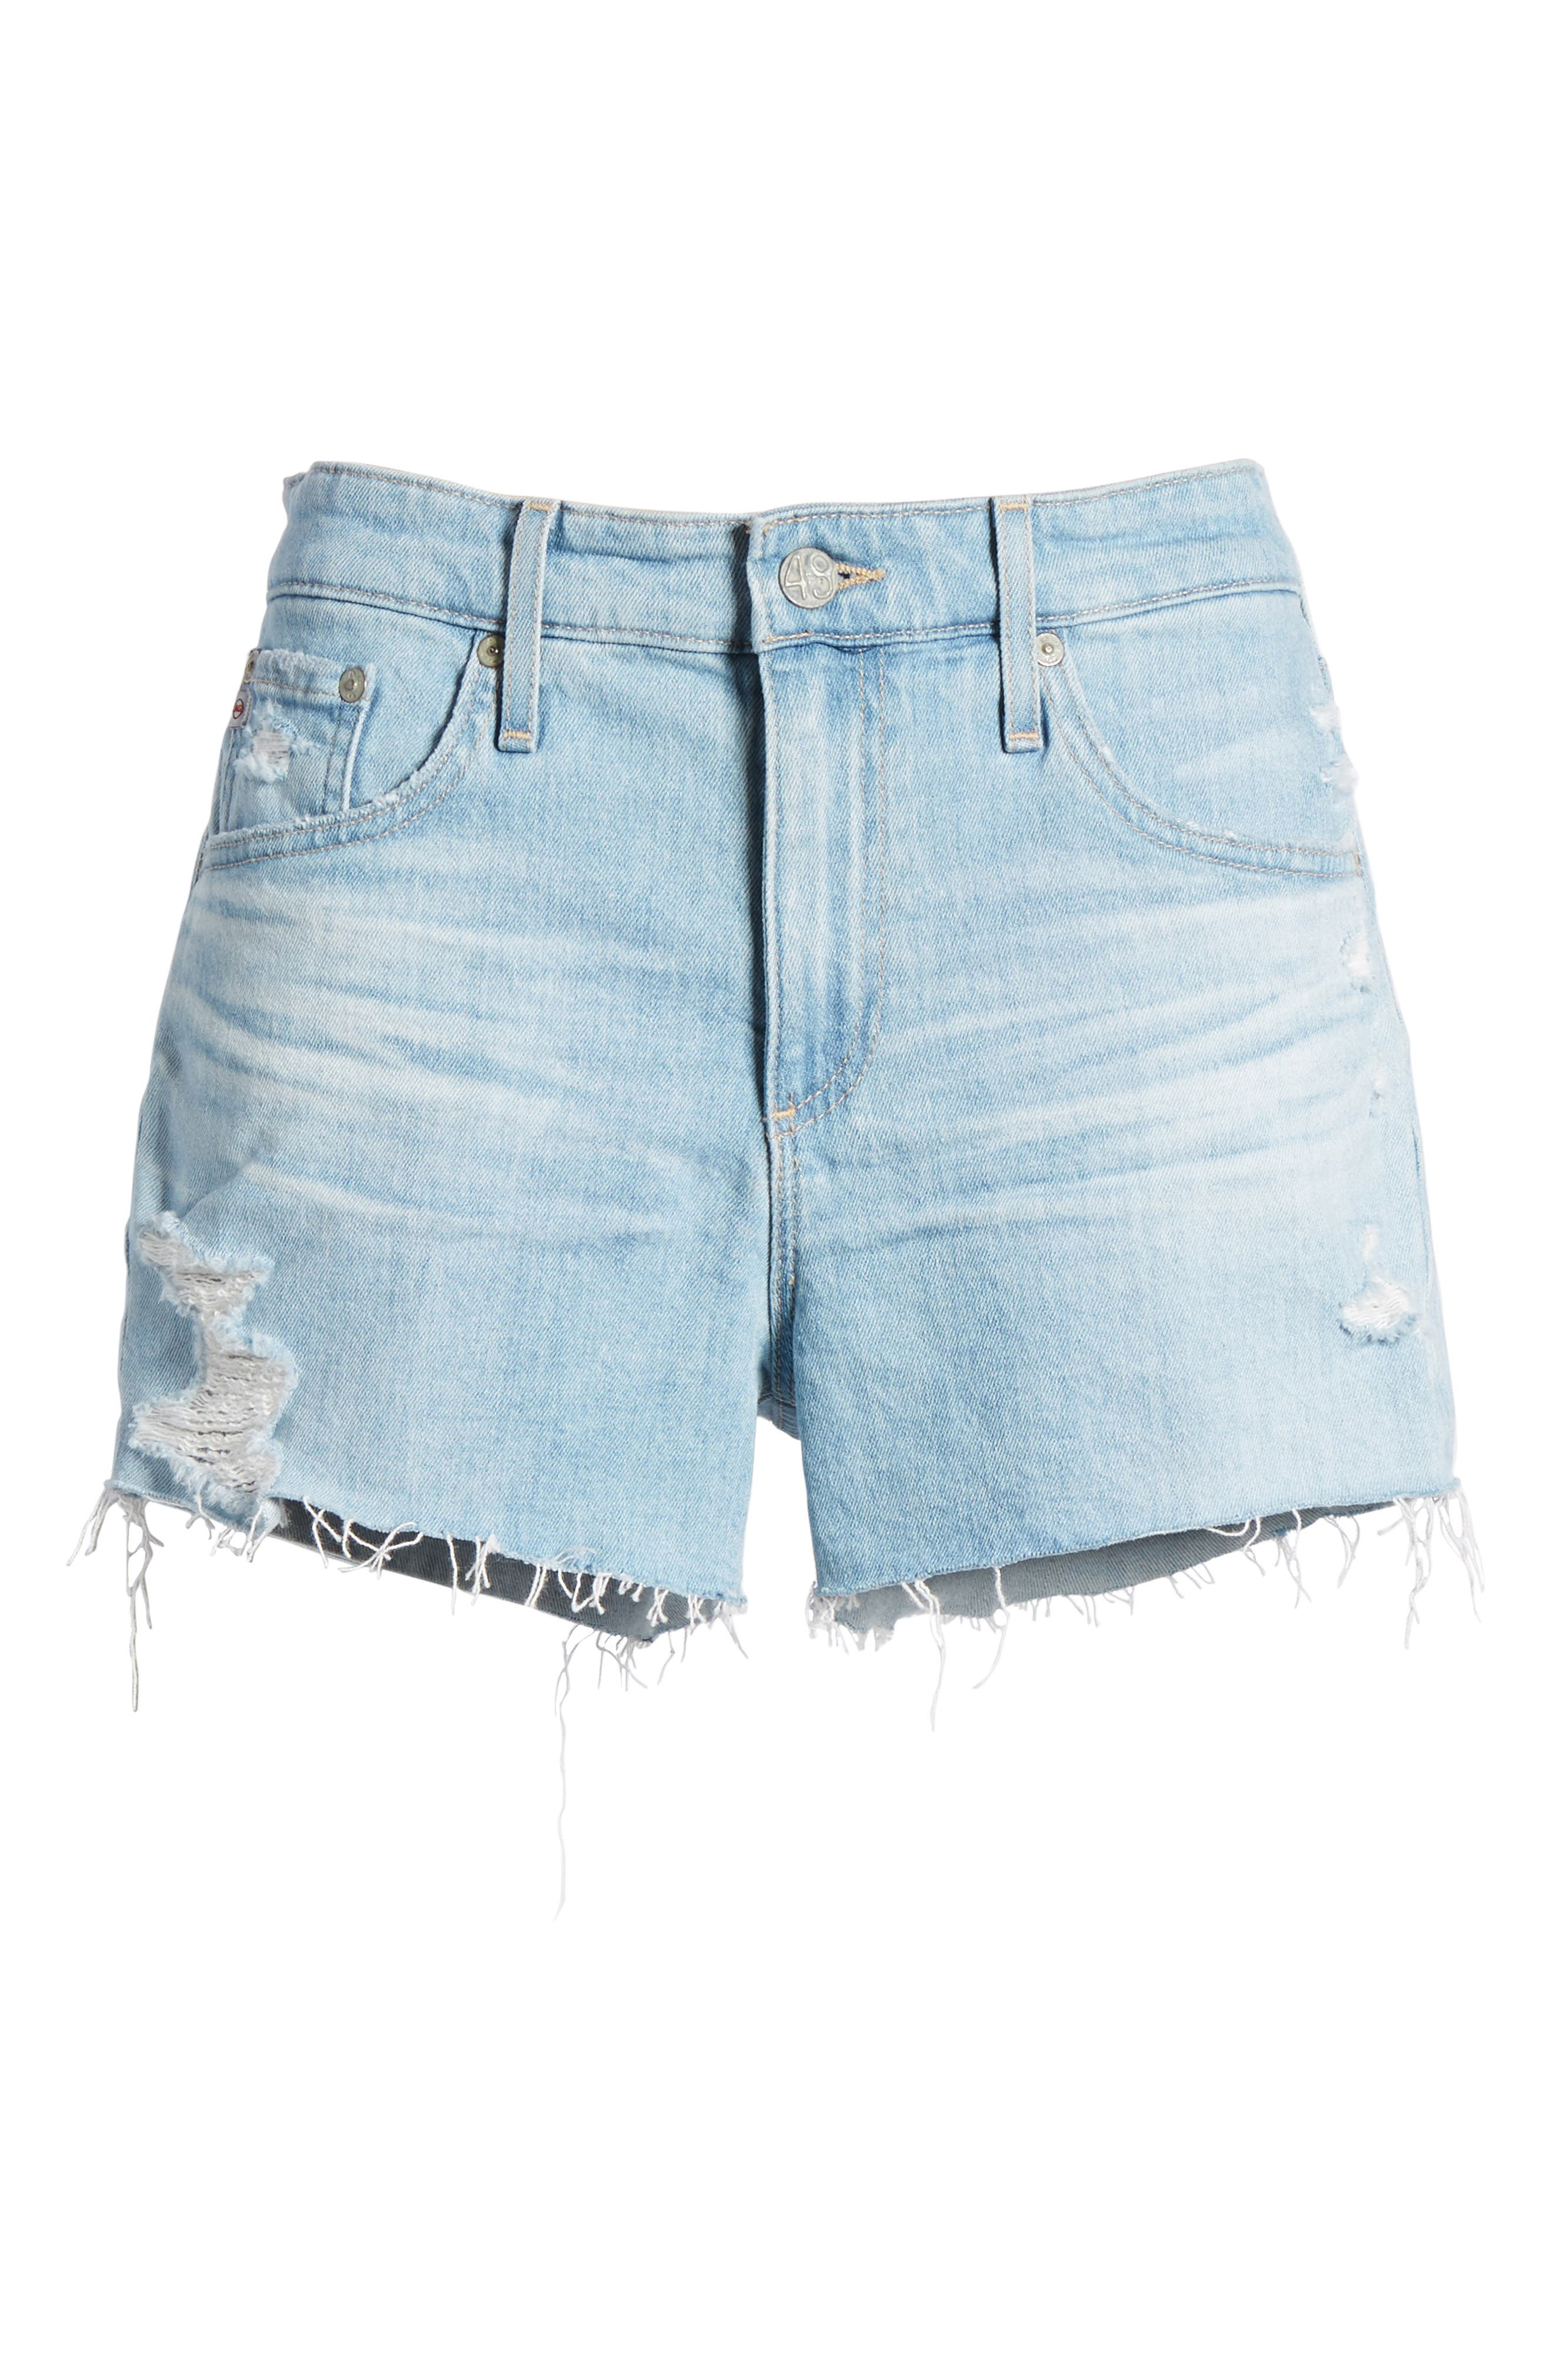 Bryn High Waist Cutoff Denim Shorts,                             Alternate thumbnail 7, color,                             23 Years Cerulean Chase